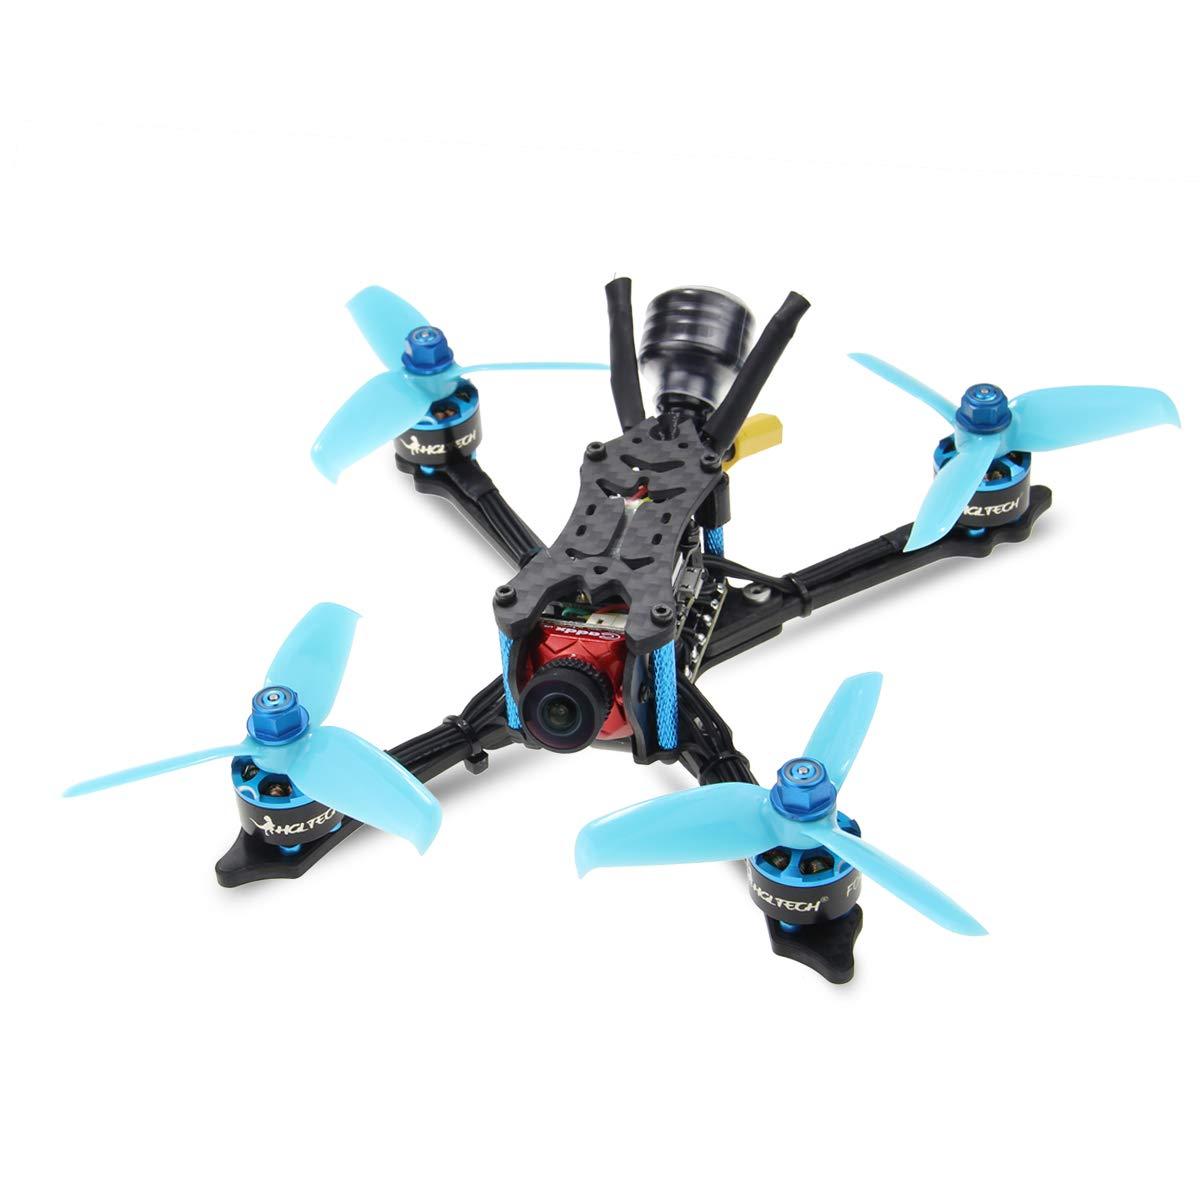 HGLRC Brushless Blheli32 Quadcopters Multirotors